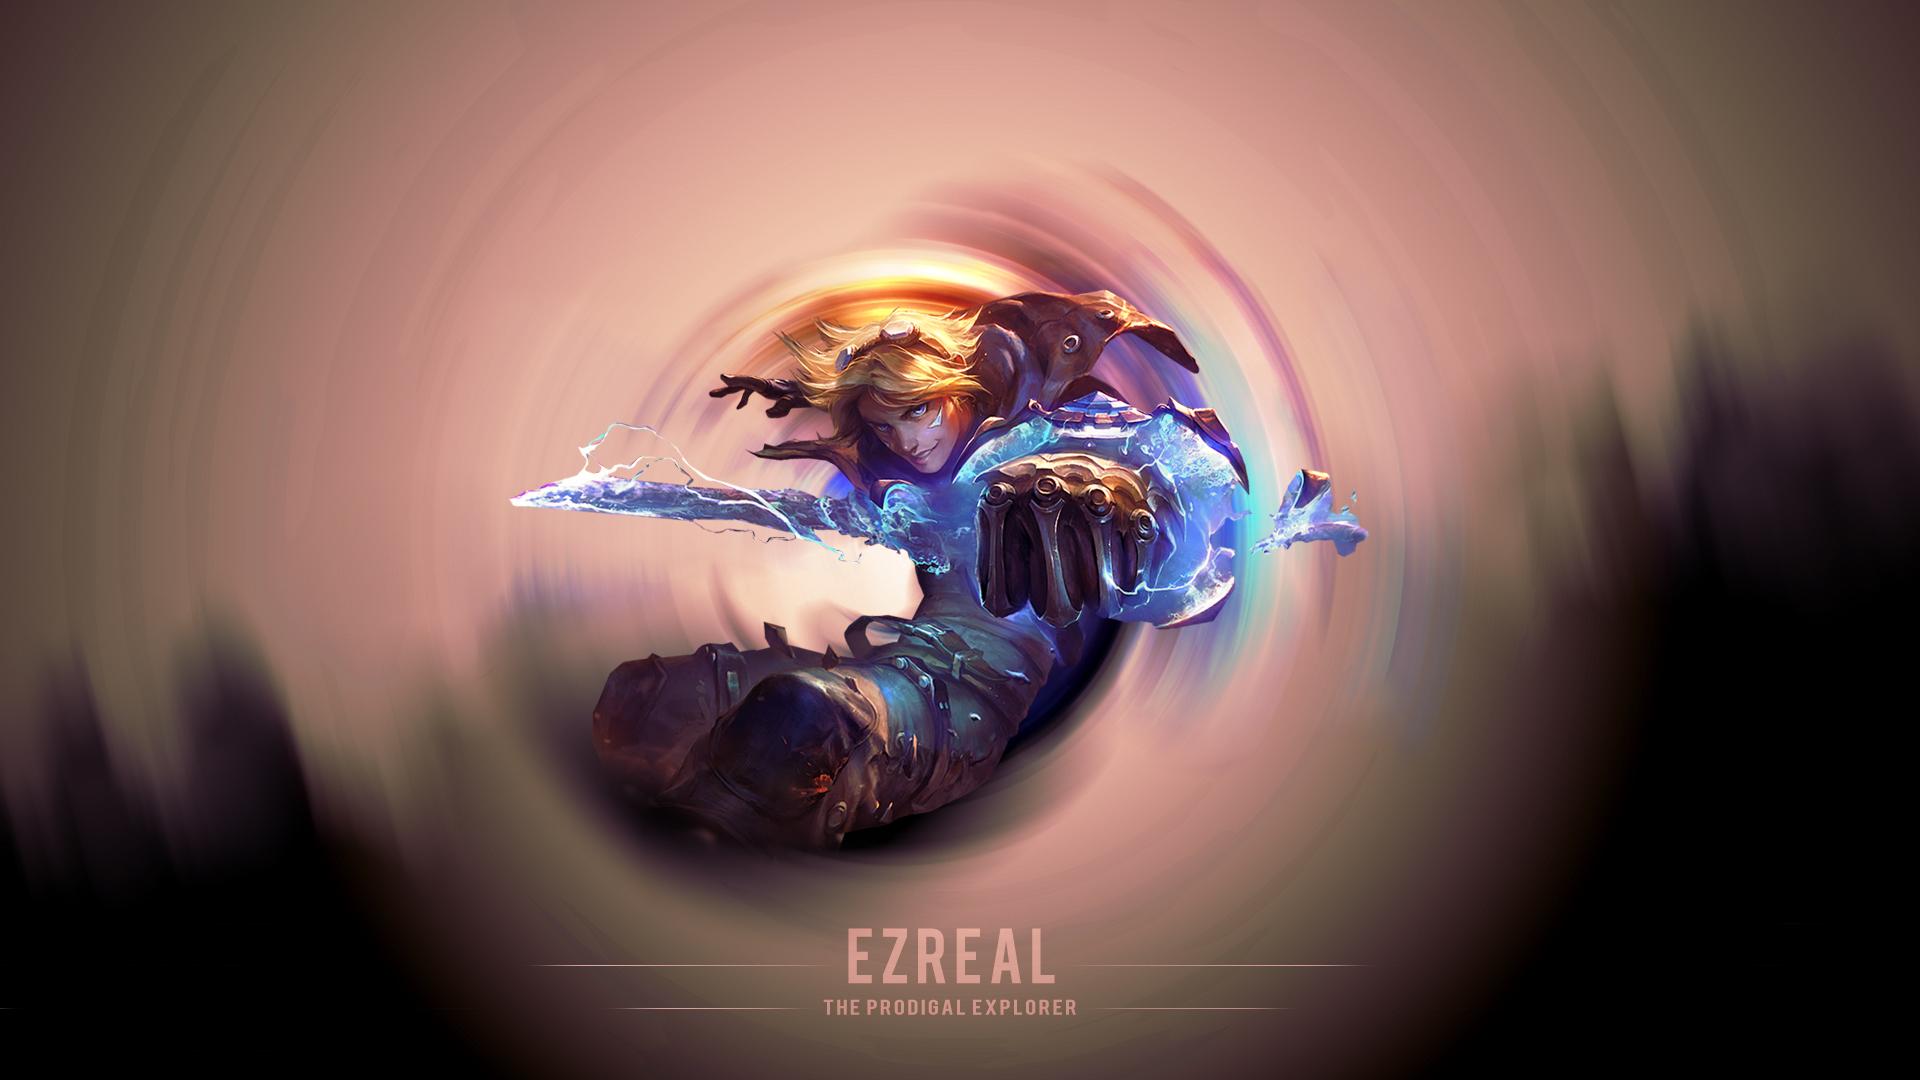 Ezreal The Prodigal Explorer Wallpaper by DarkunePlays on ...